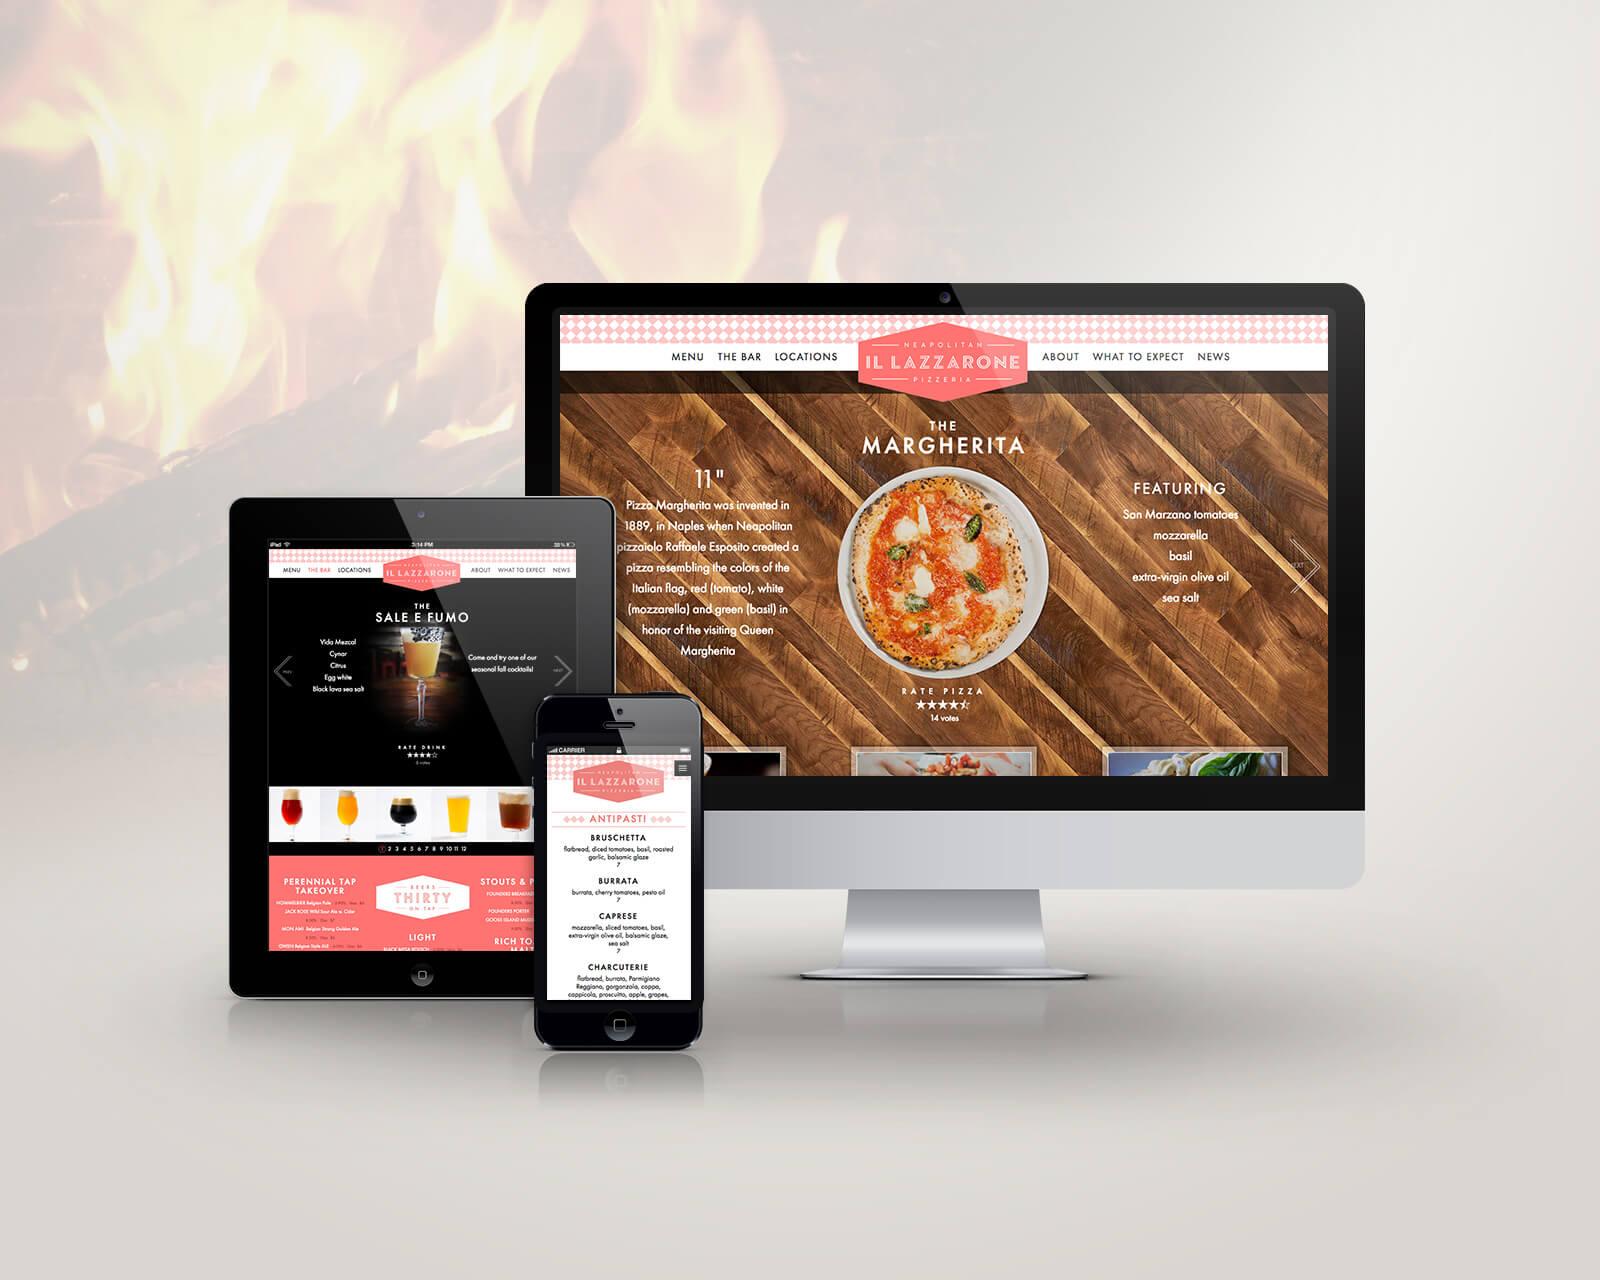 responsive website design and development